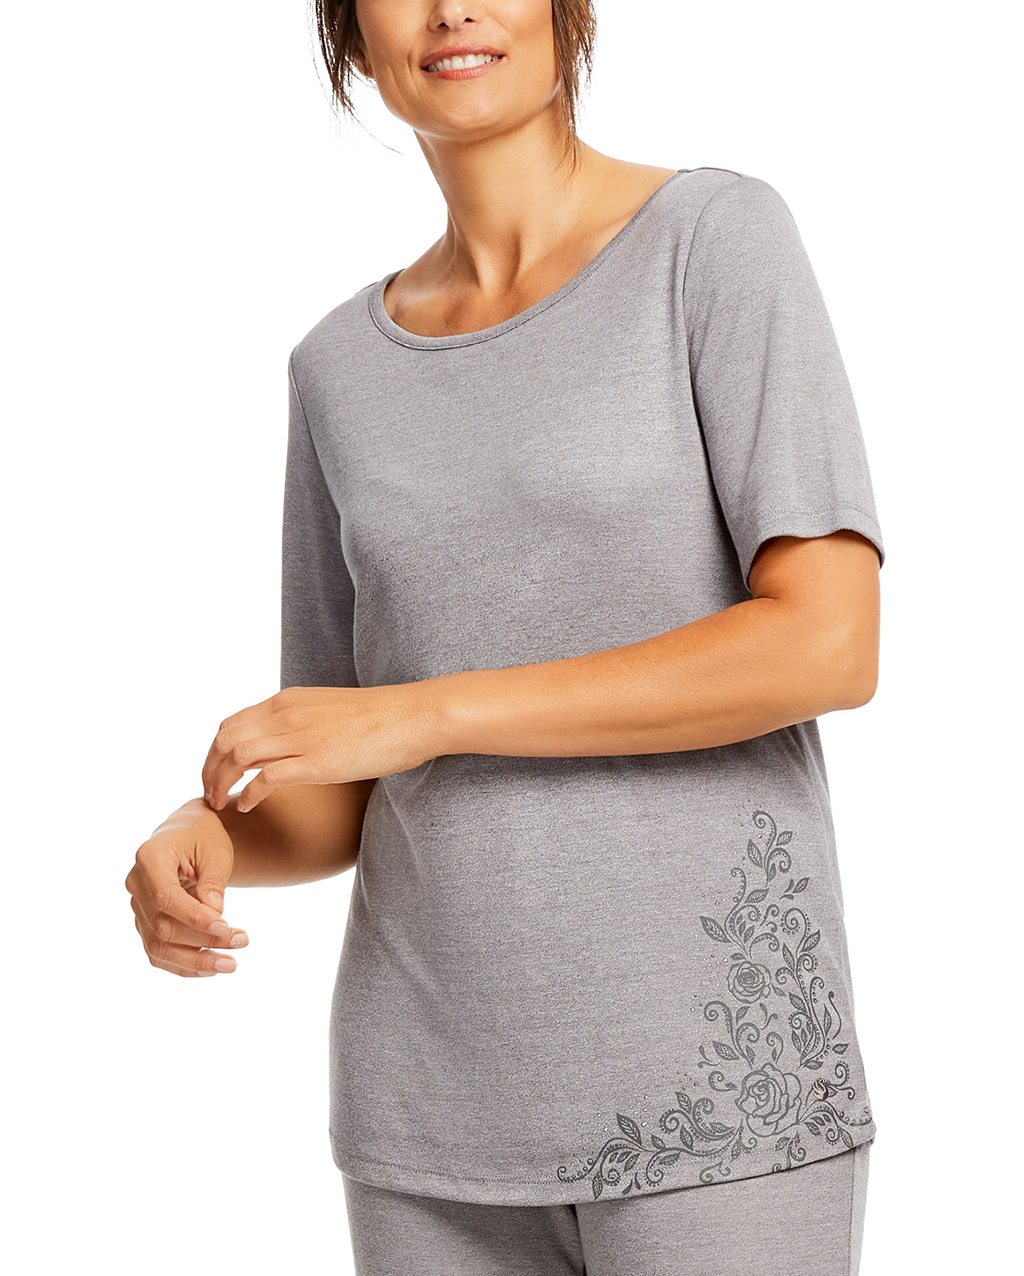 Gloria Vanderbilt Women's and Women's Plus Laura B Short Sleeve Sleep Top